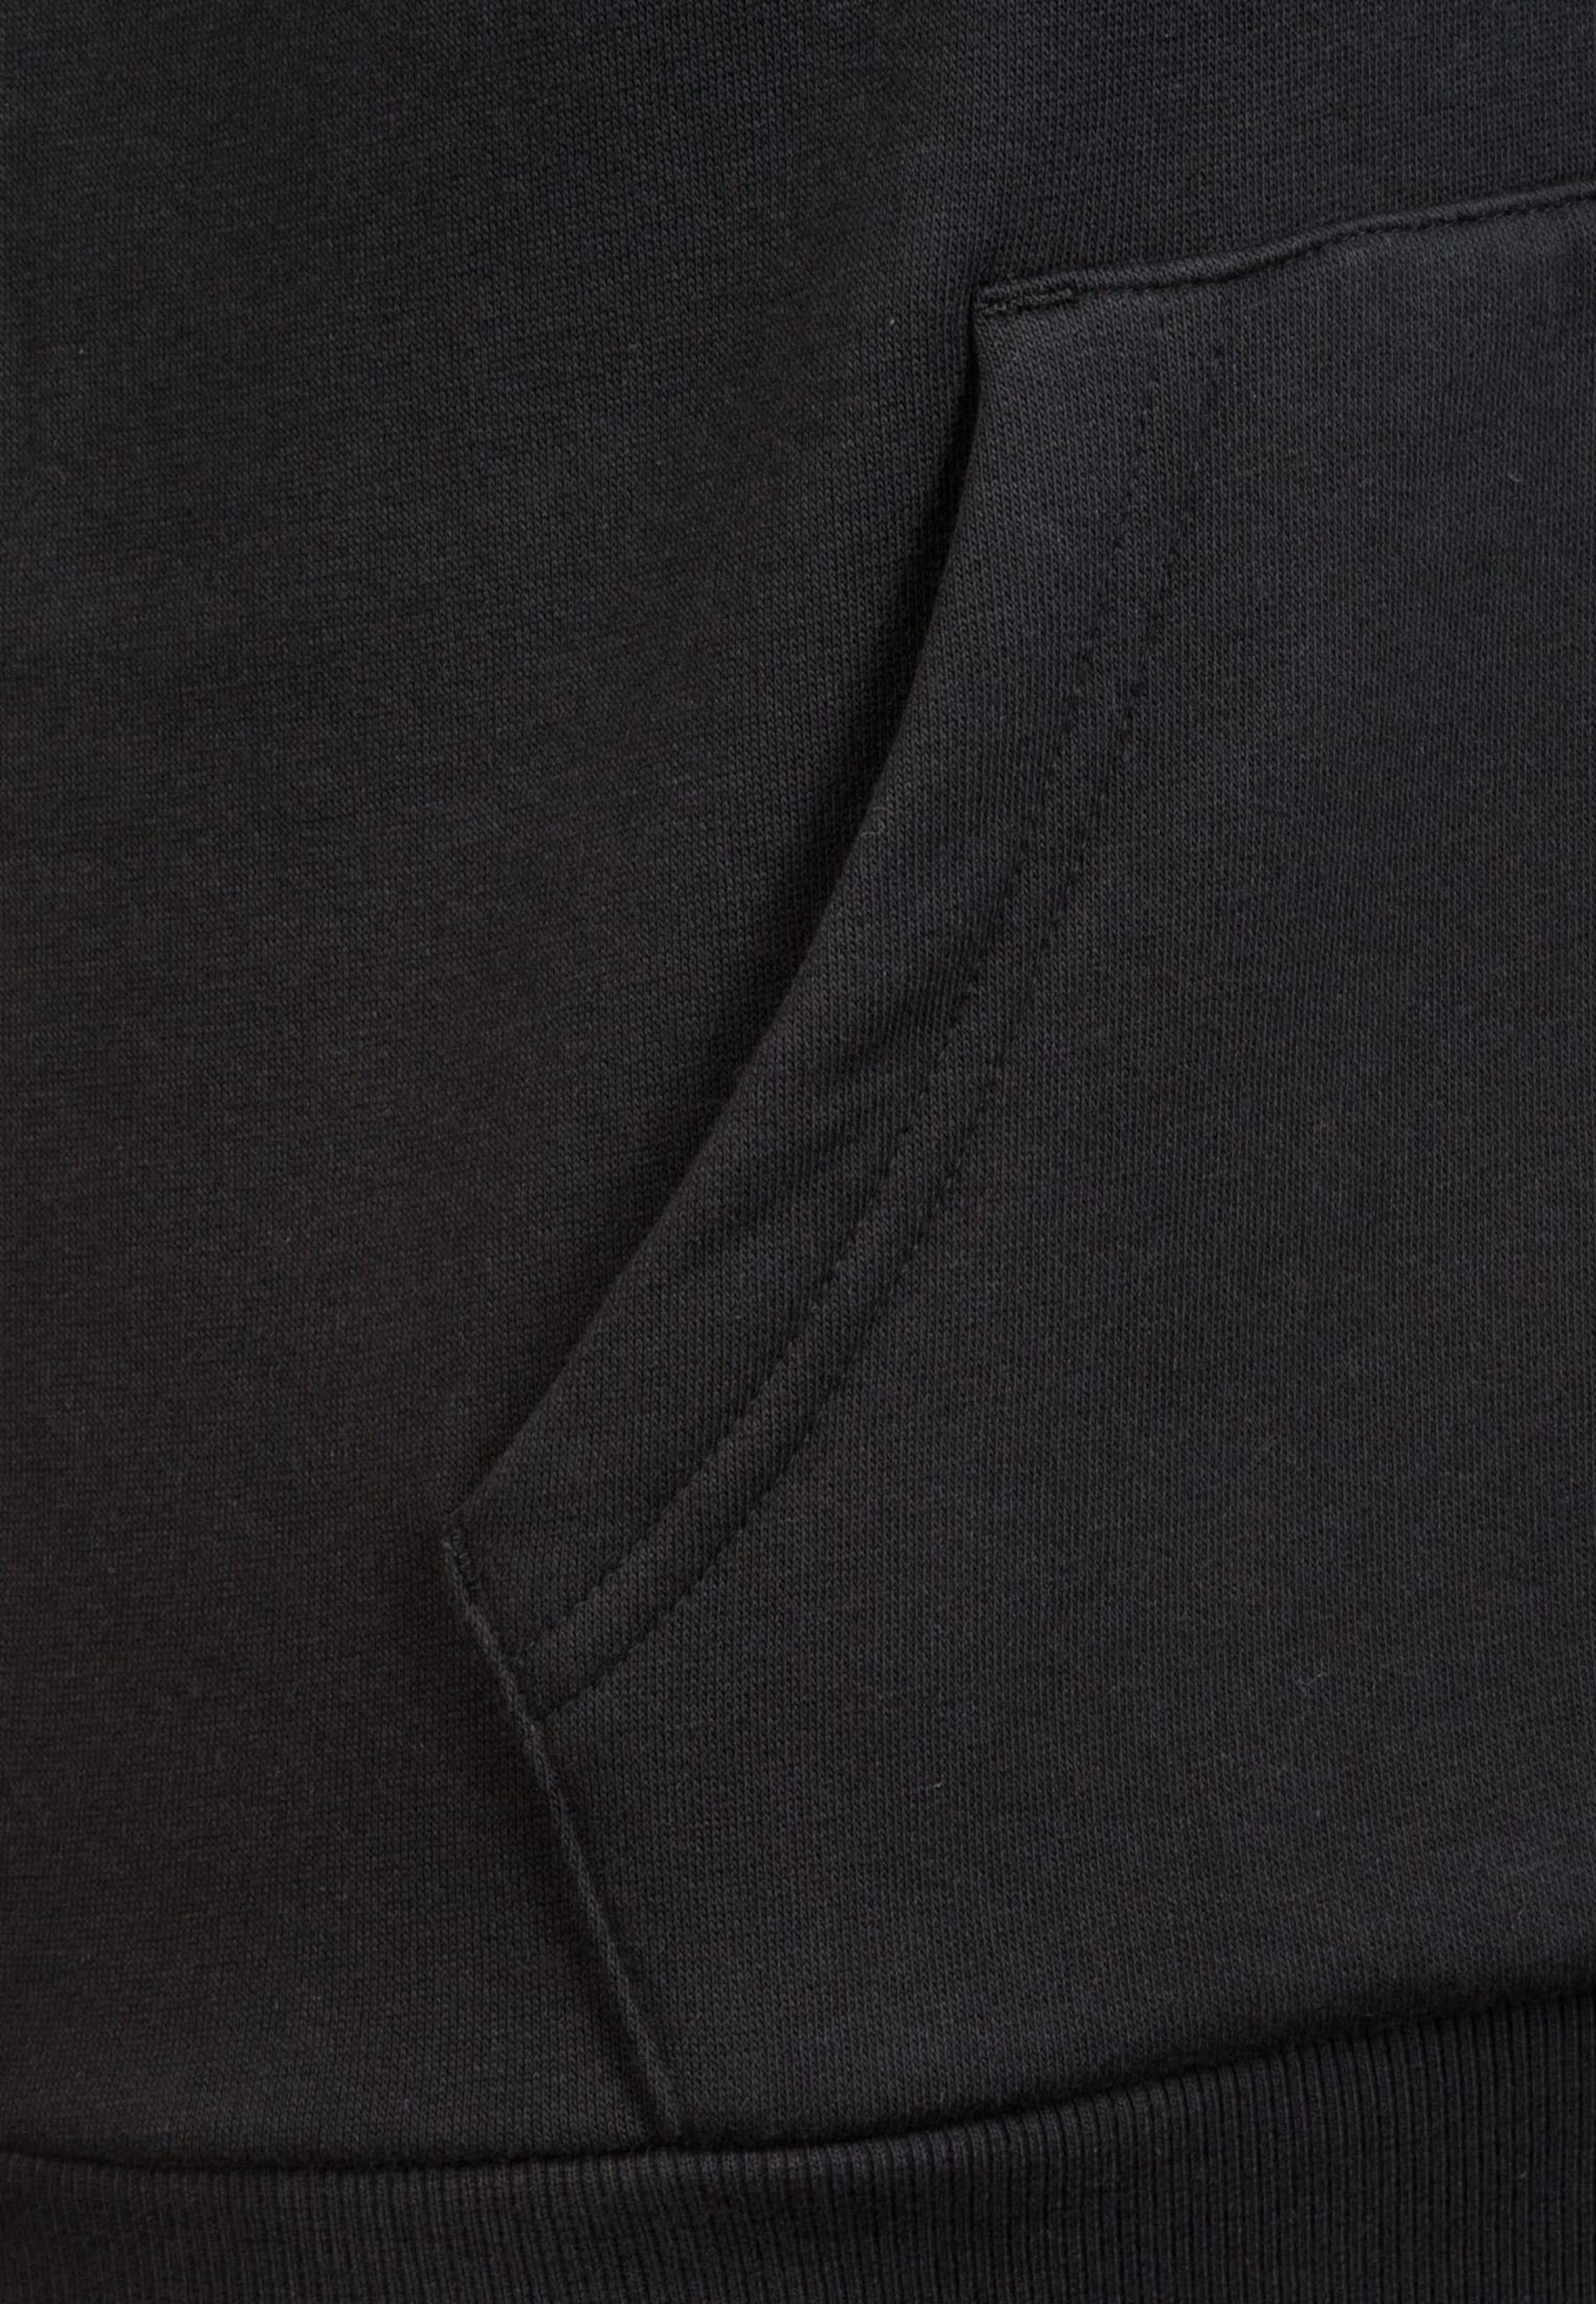 NoirBlanc En 'star Sweat Converse Chevron' shirt CBthdrsQx